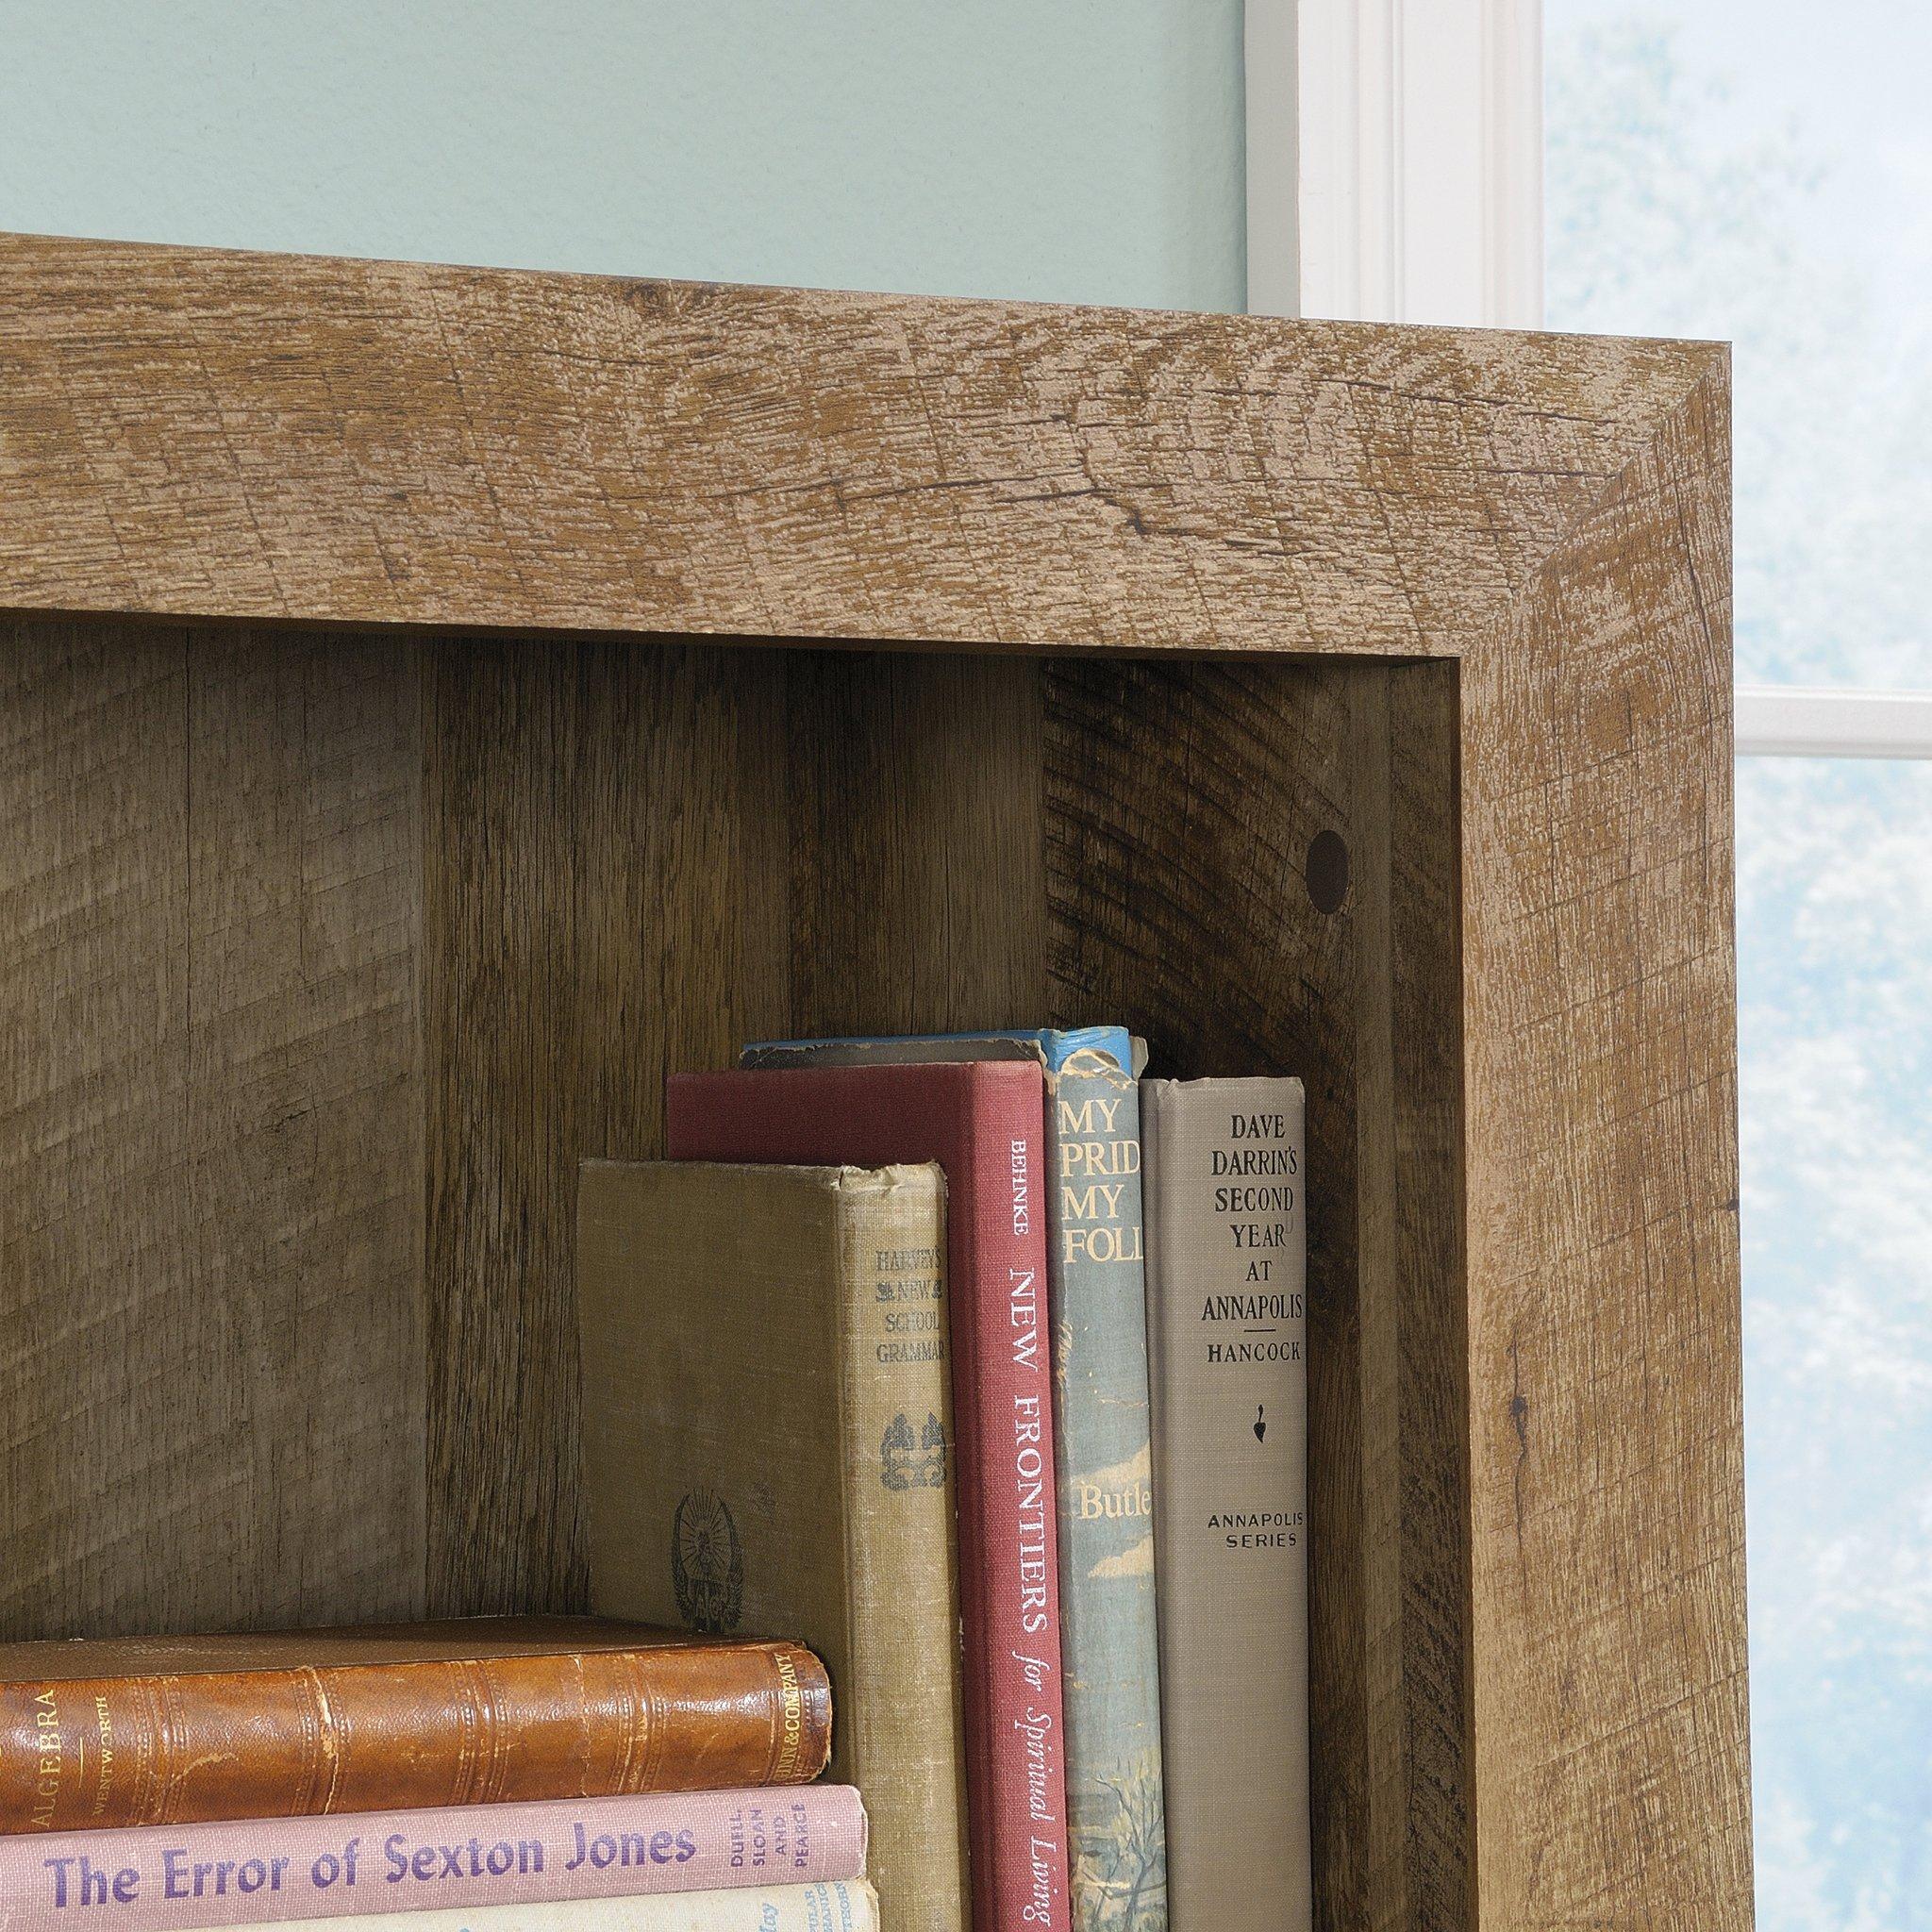 Sauder 418546 Dakota Pass 5-Shelf Bookcase, L: 33.78'' x W: 12.52'' x H: 71.1, Craftsman Oak finish by Sauder (Image #8)